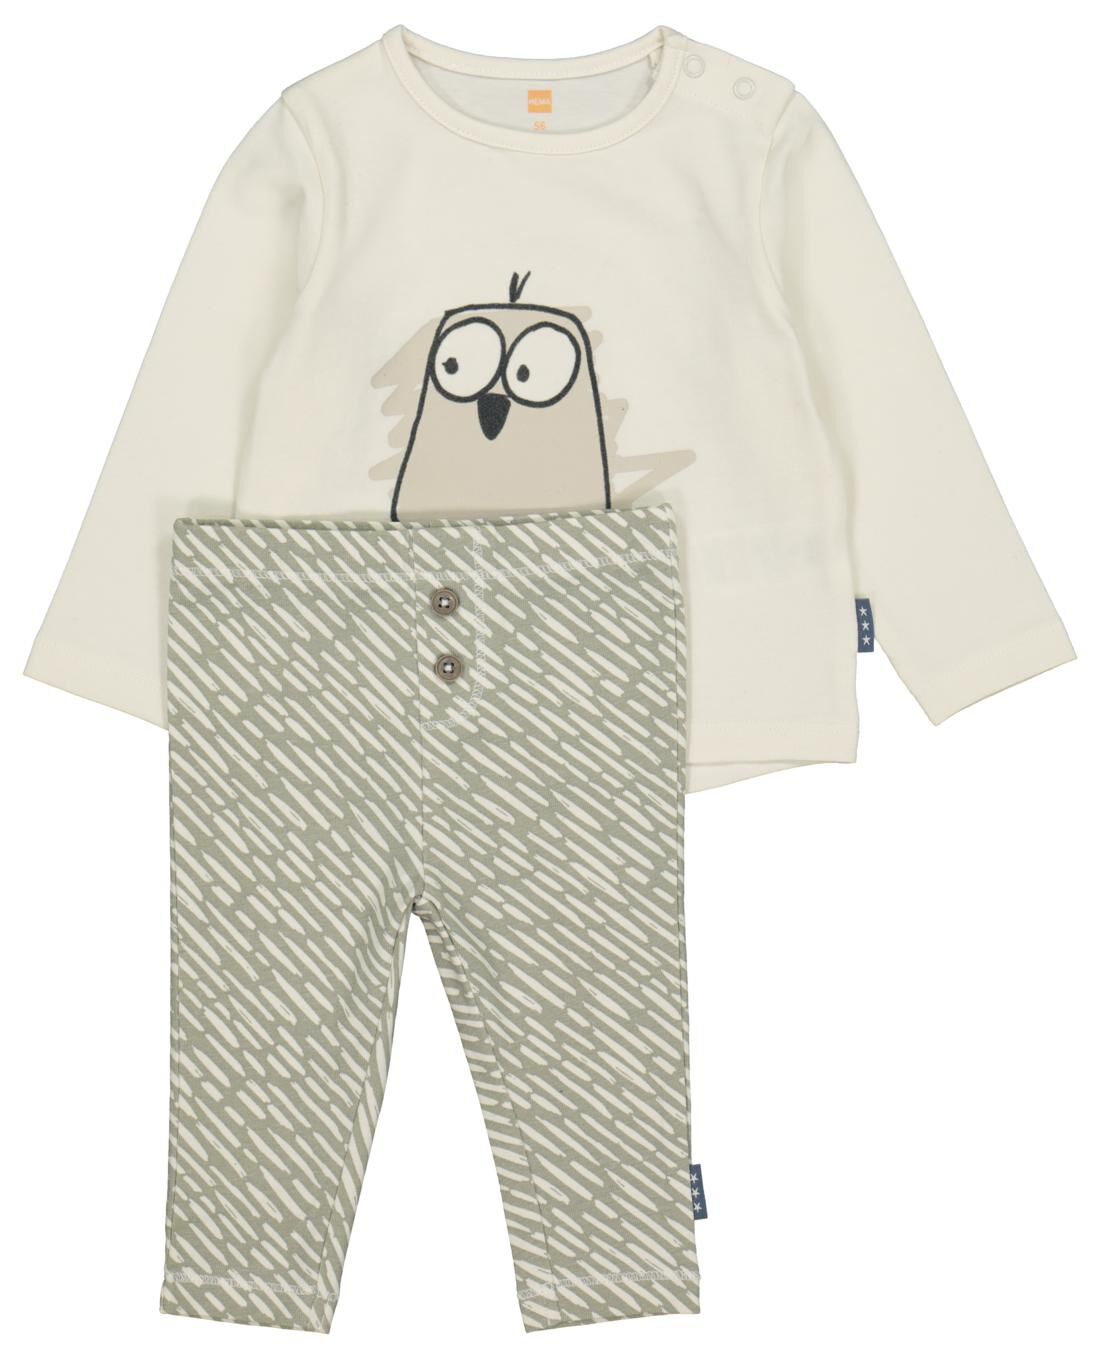 HEMA Newborn Setje T-shirt En Broek Groen (groen)